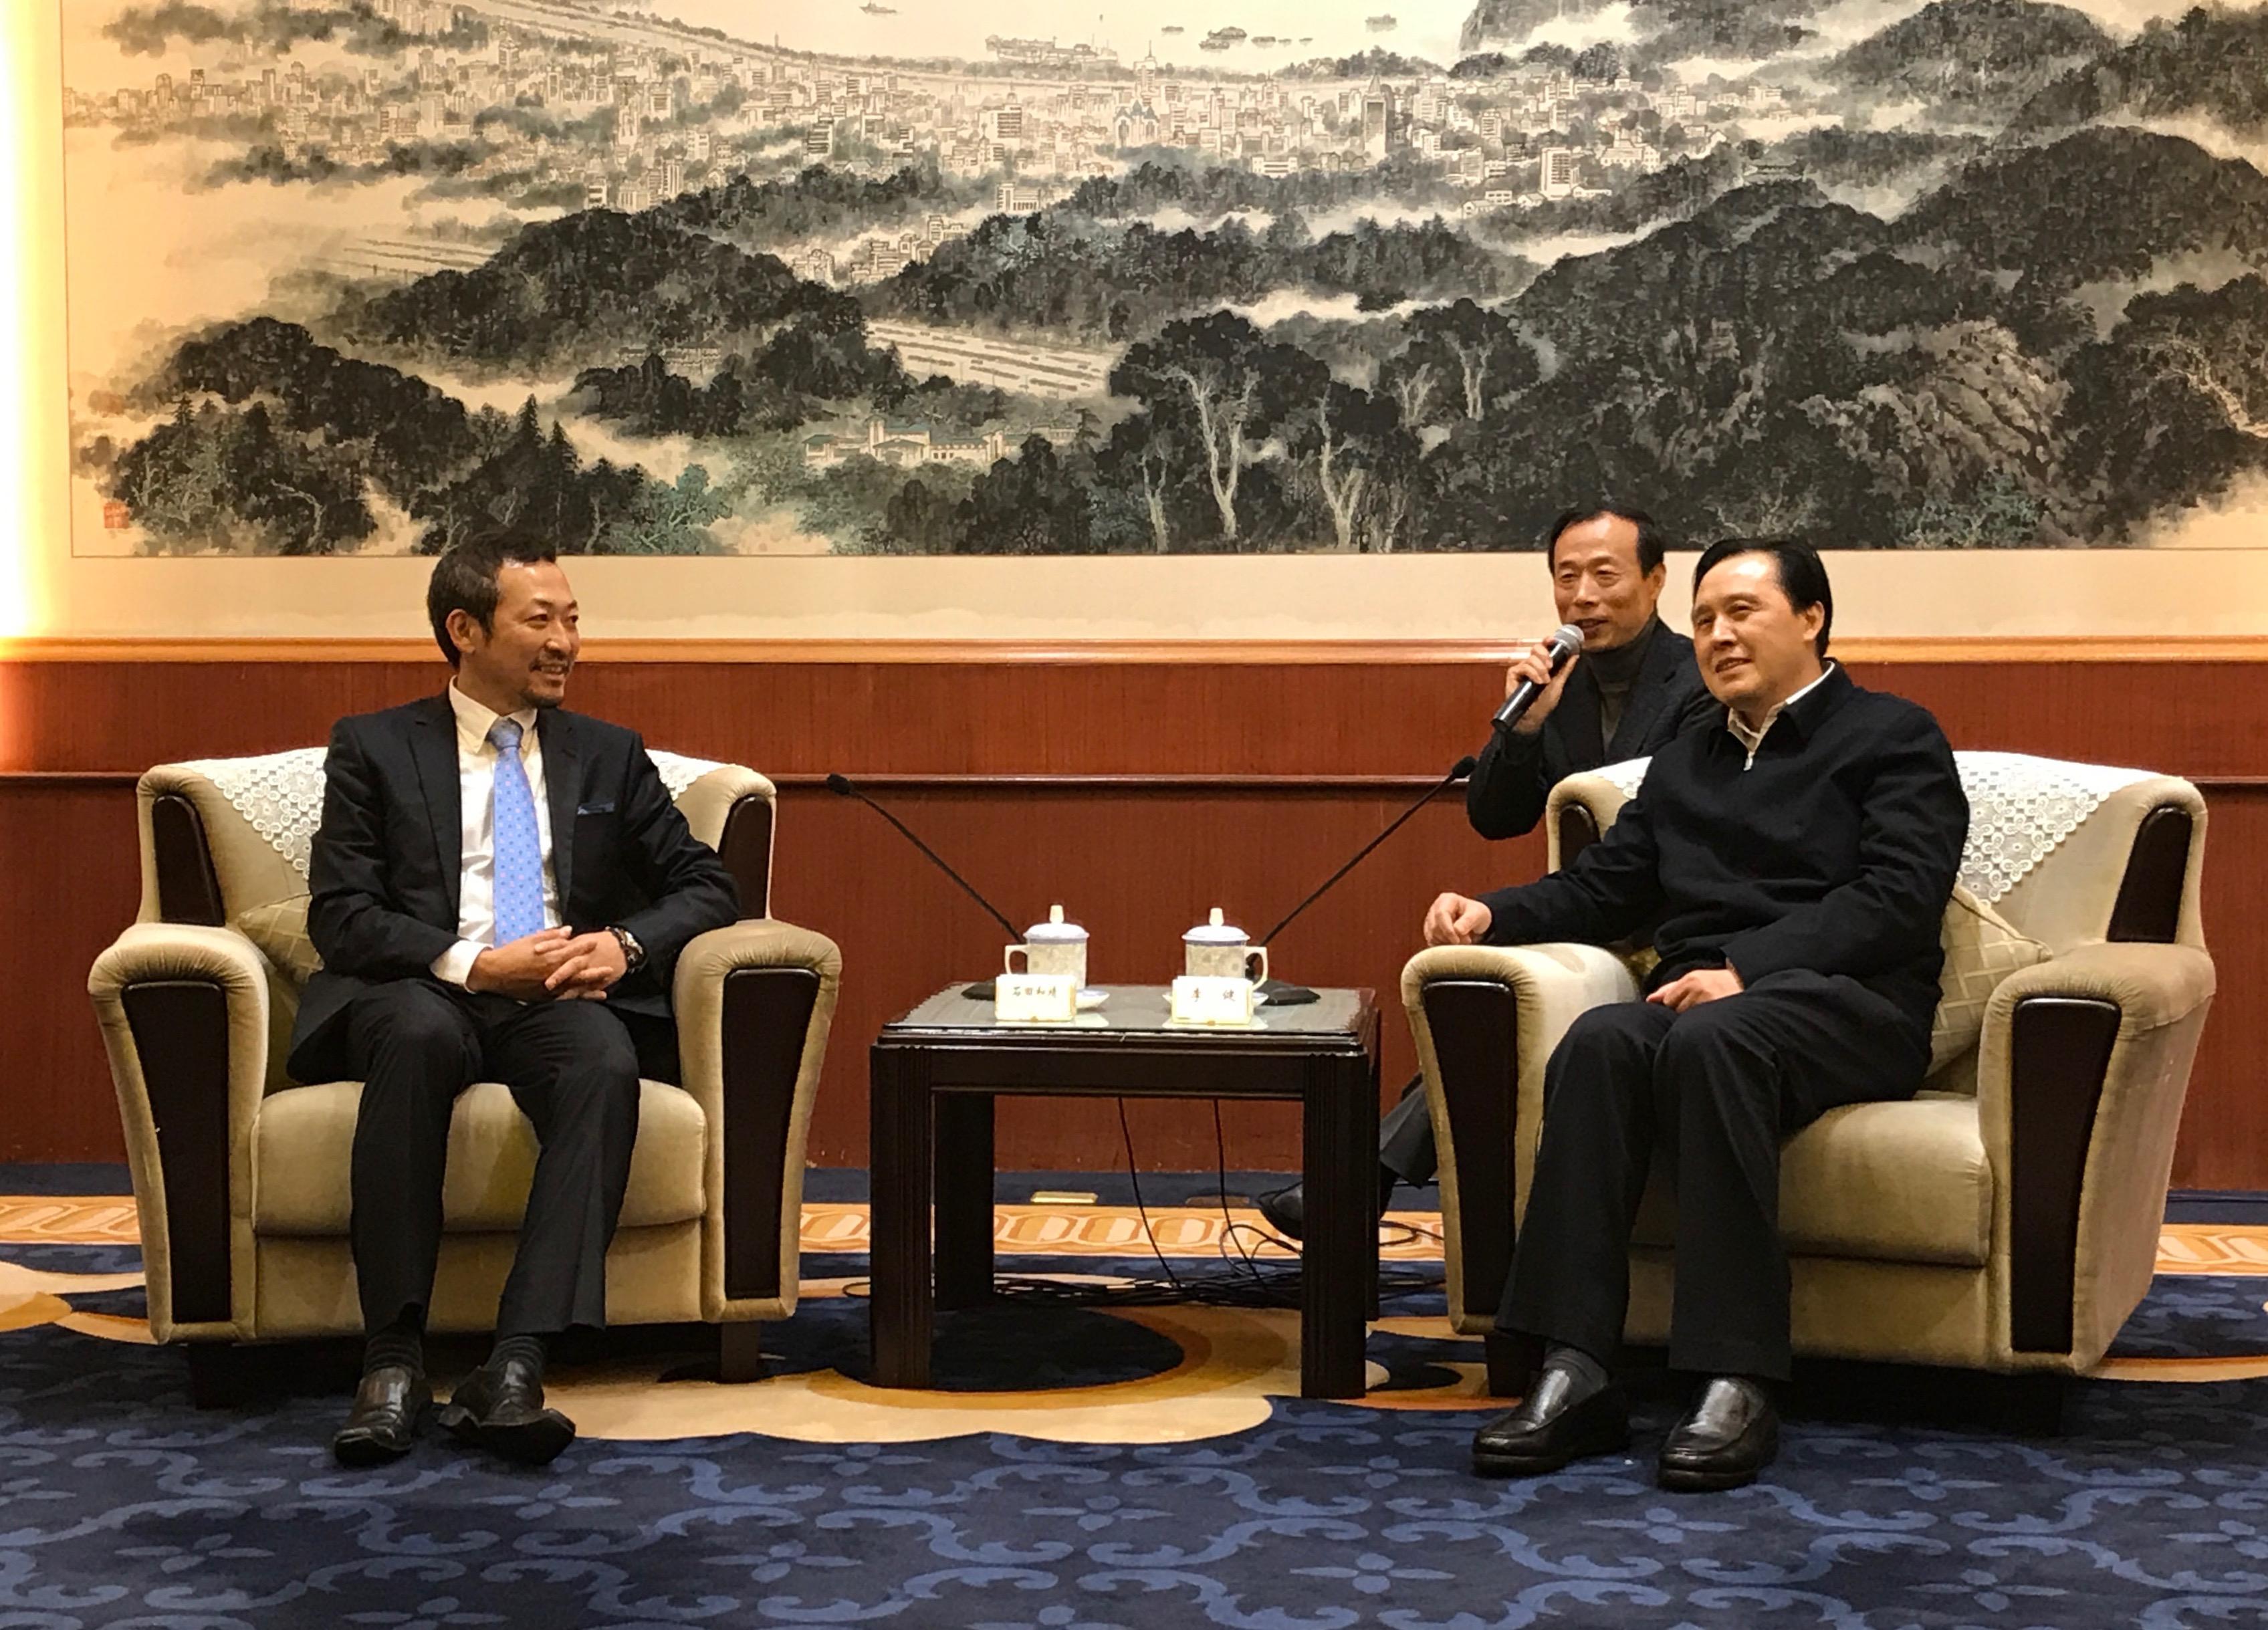 中国江蘇省人民政府幹部との記者会見